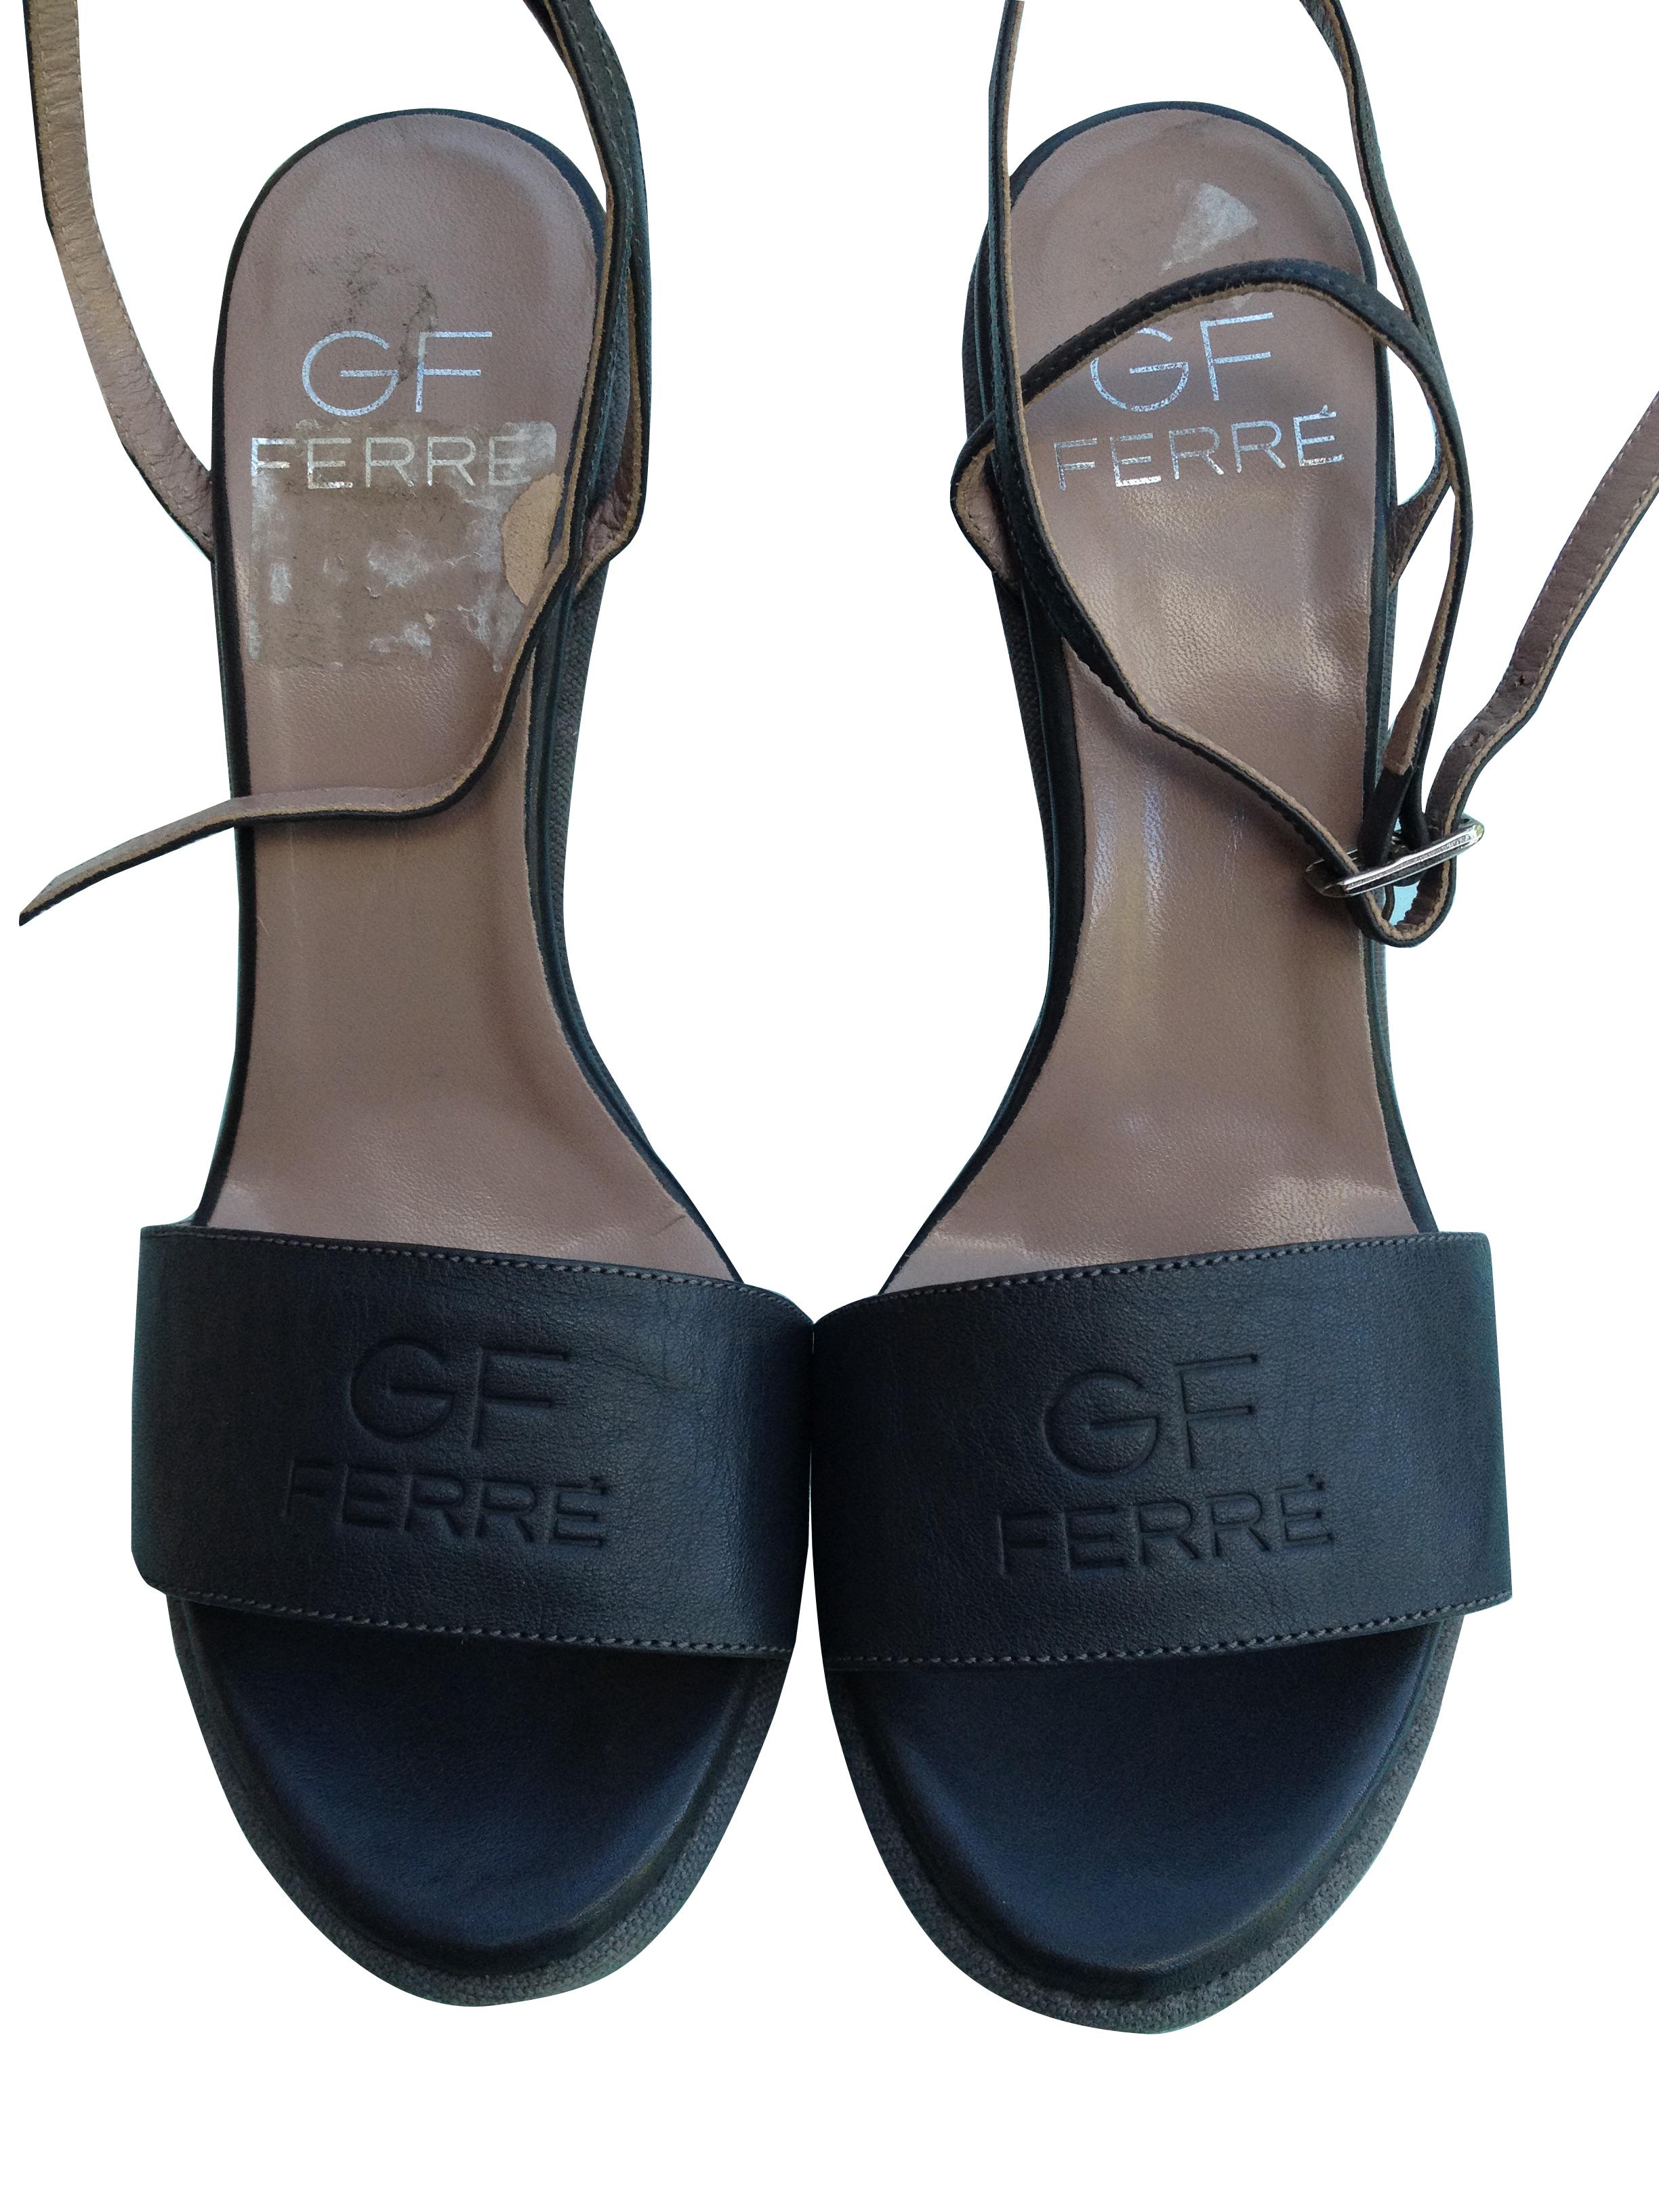 Gianfranco Ferre wedge sandals